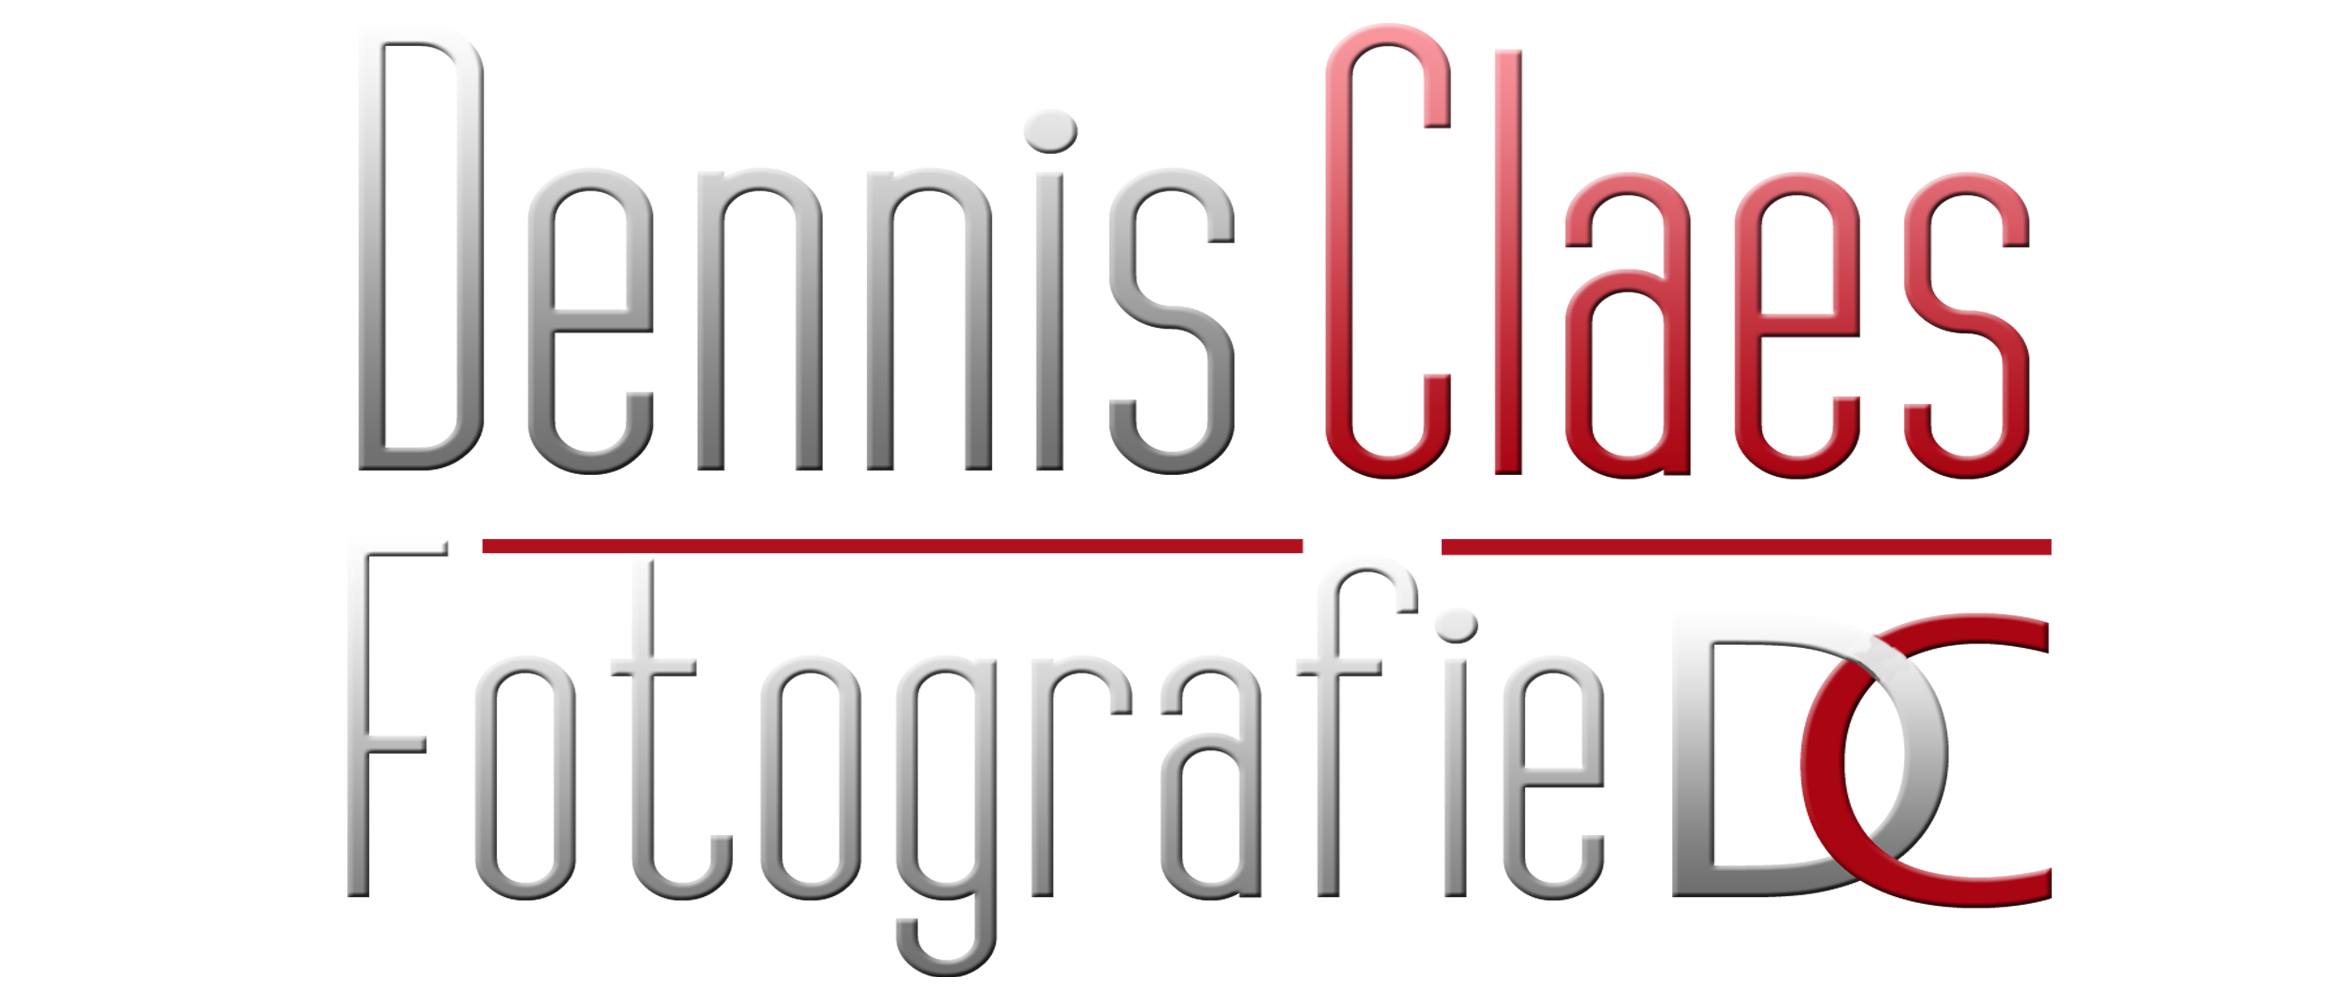 Dennis Claes Fotografie - Professionele photoshoots voor iedereen